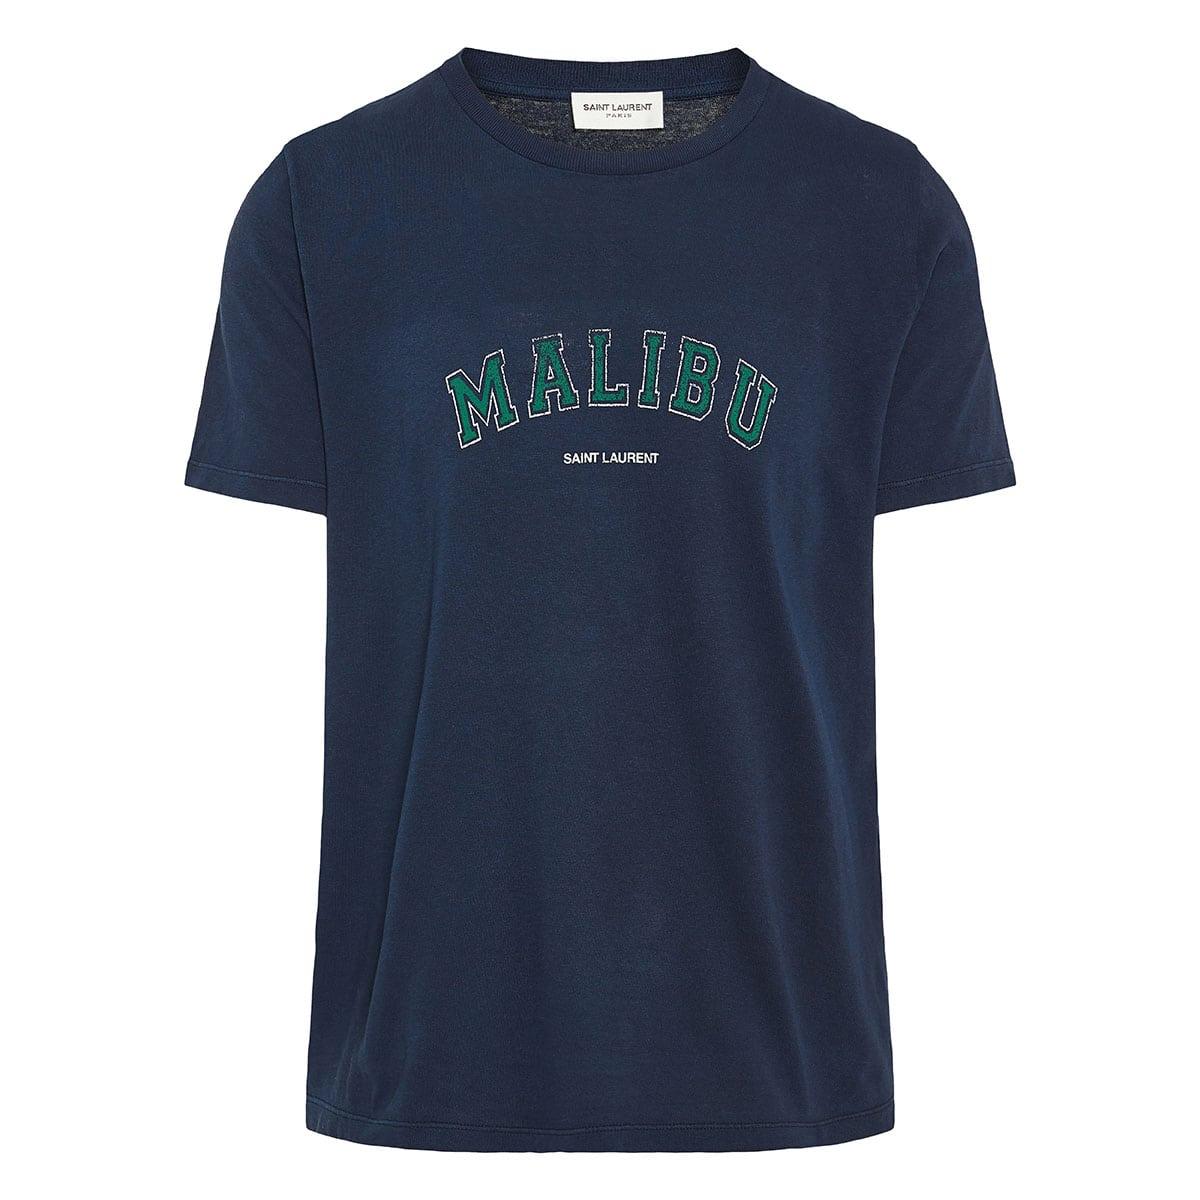 Malibu logo t-shirt